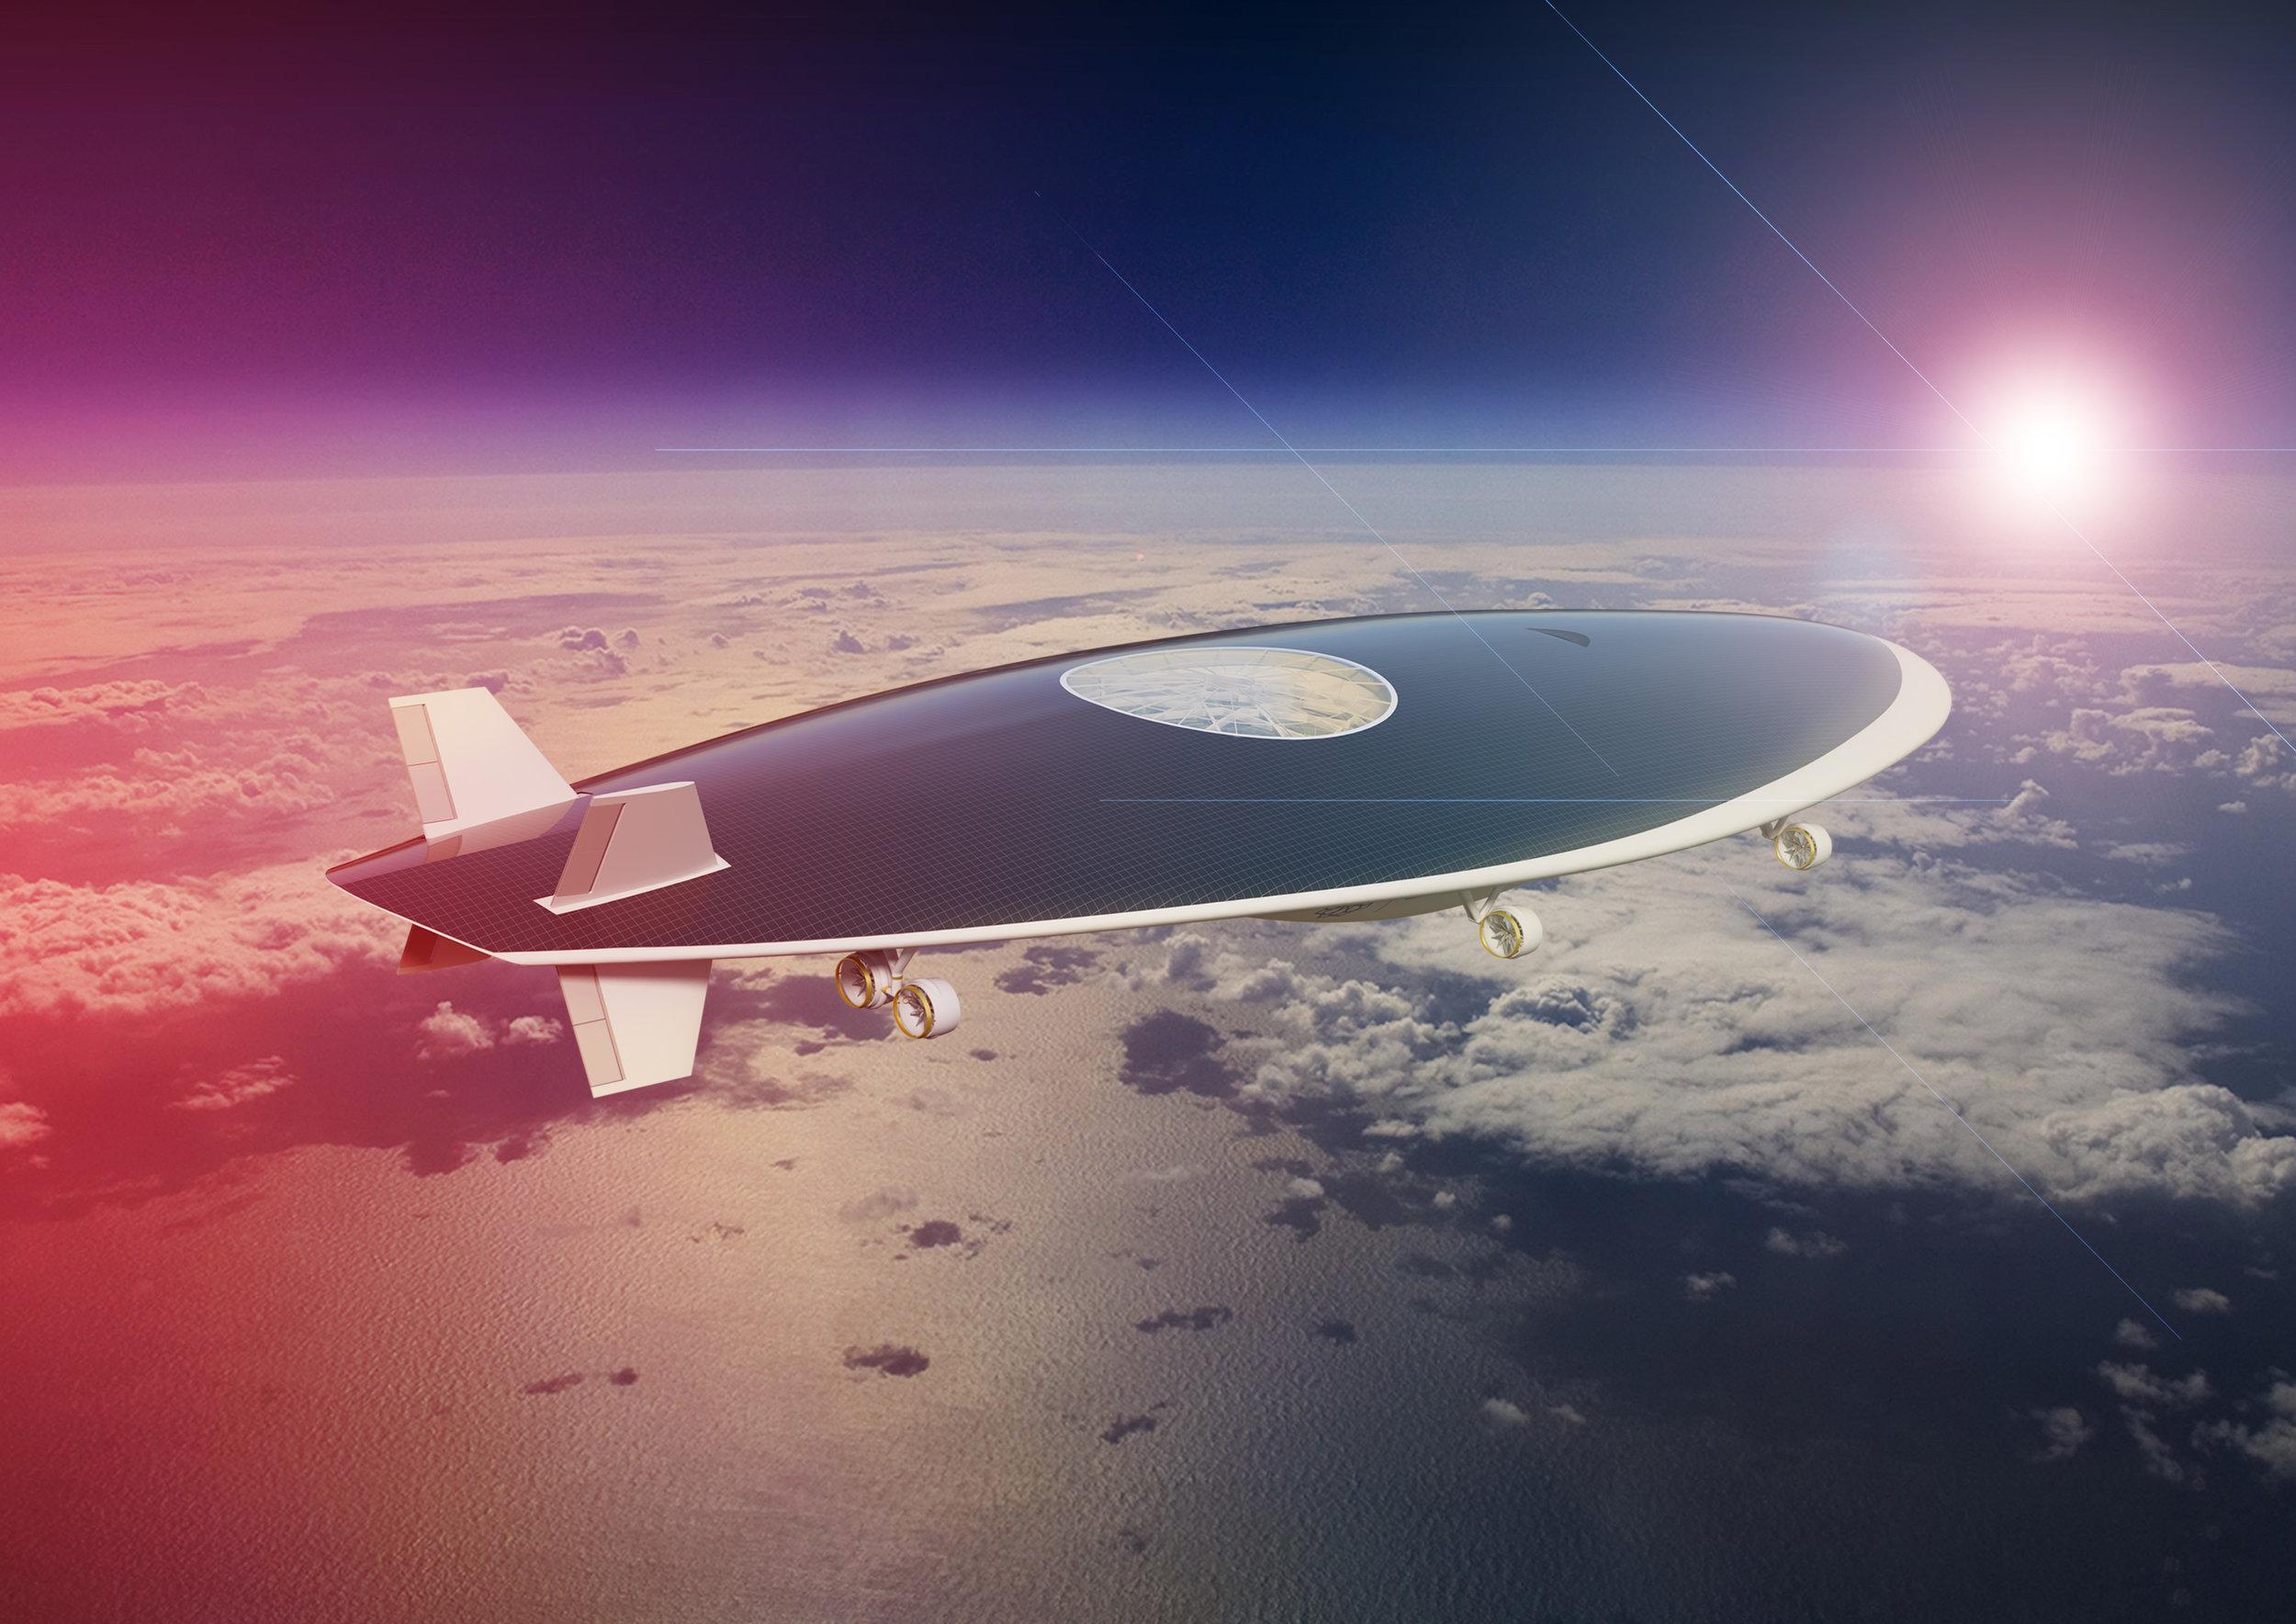 © Green Solar Airship - Jean-March Schivo, Lucilla Revelli, Gérard Feldzer